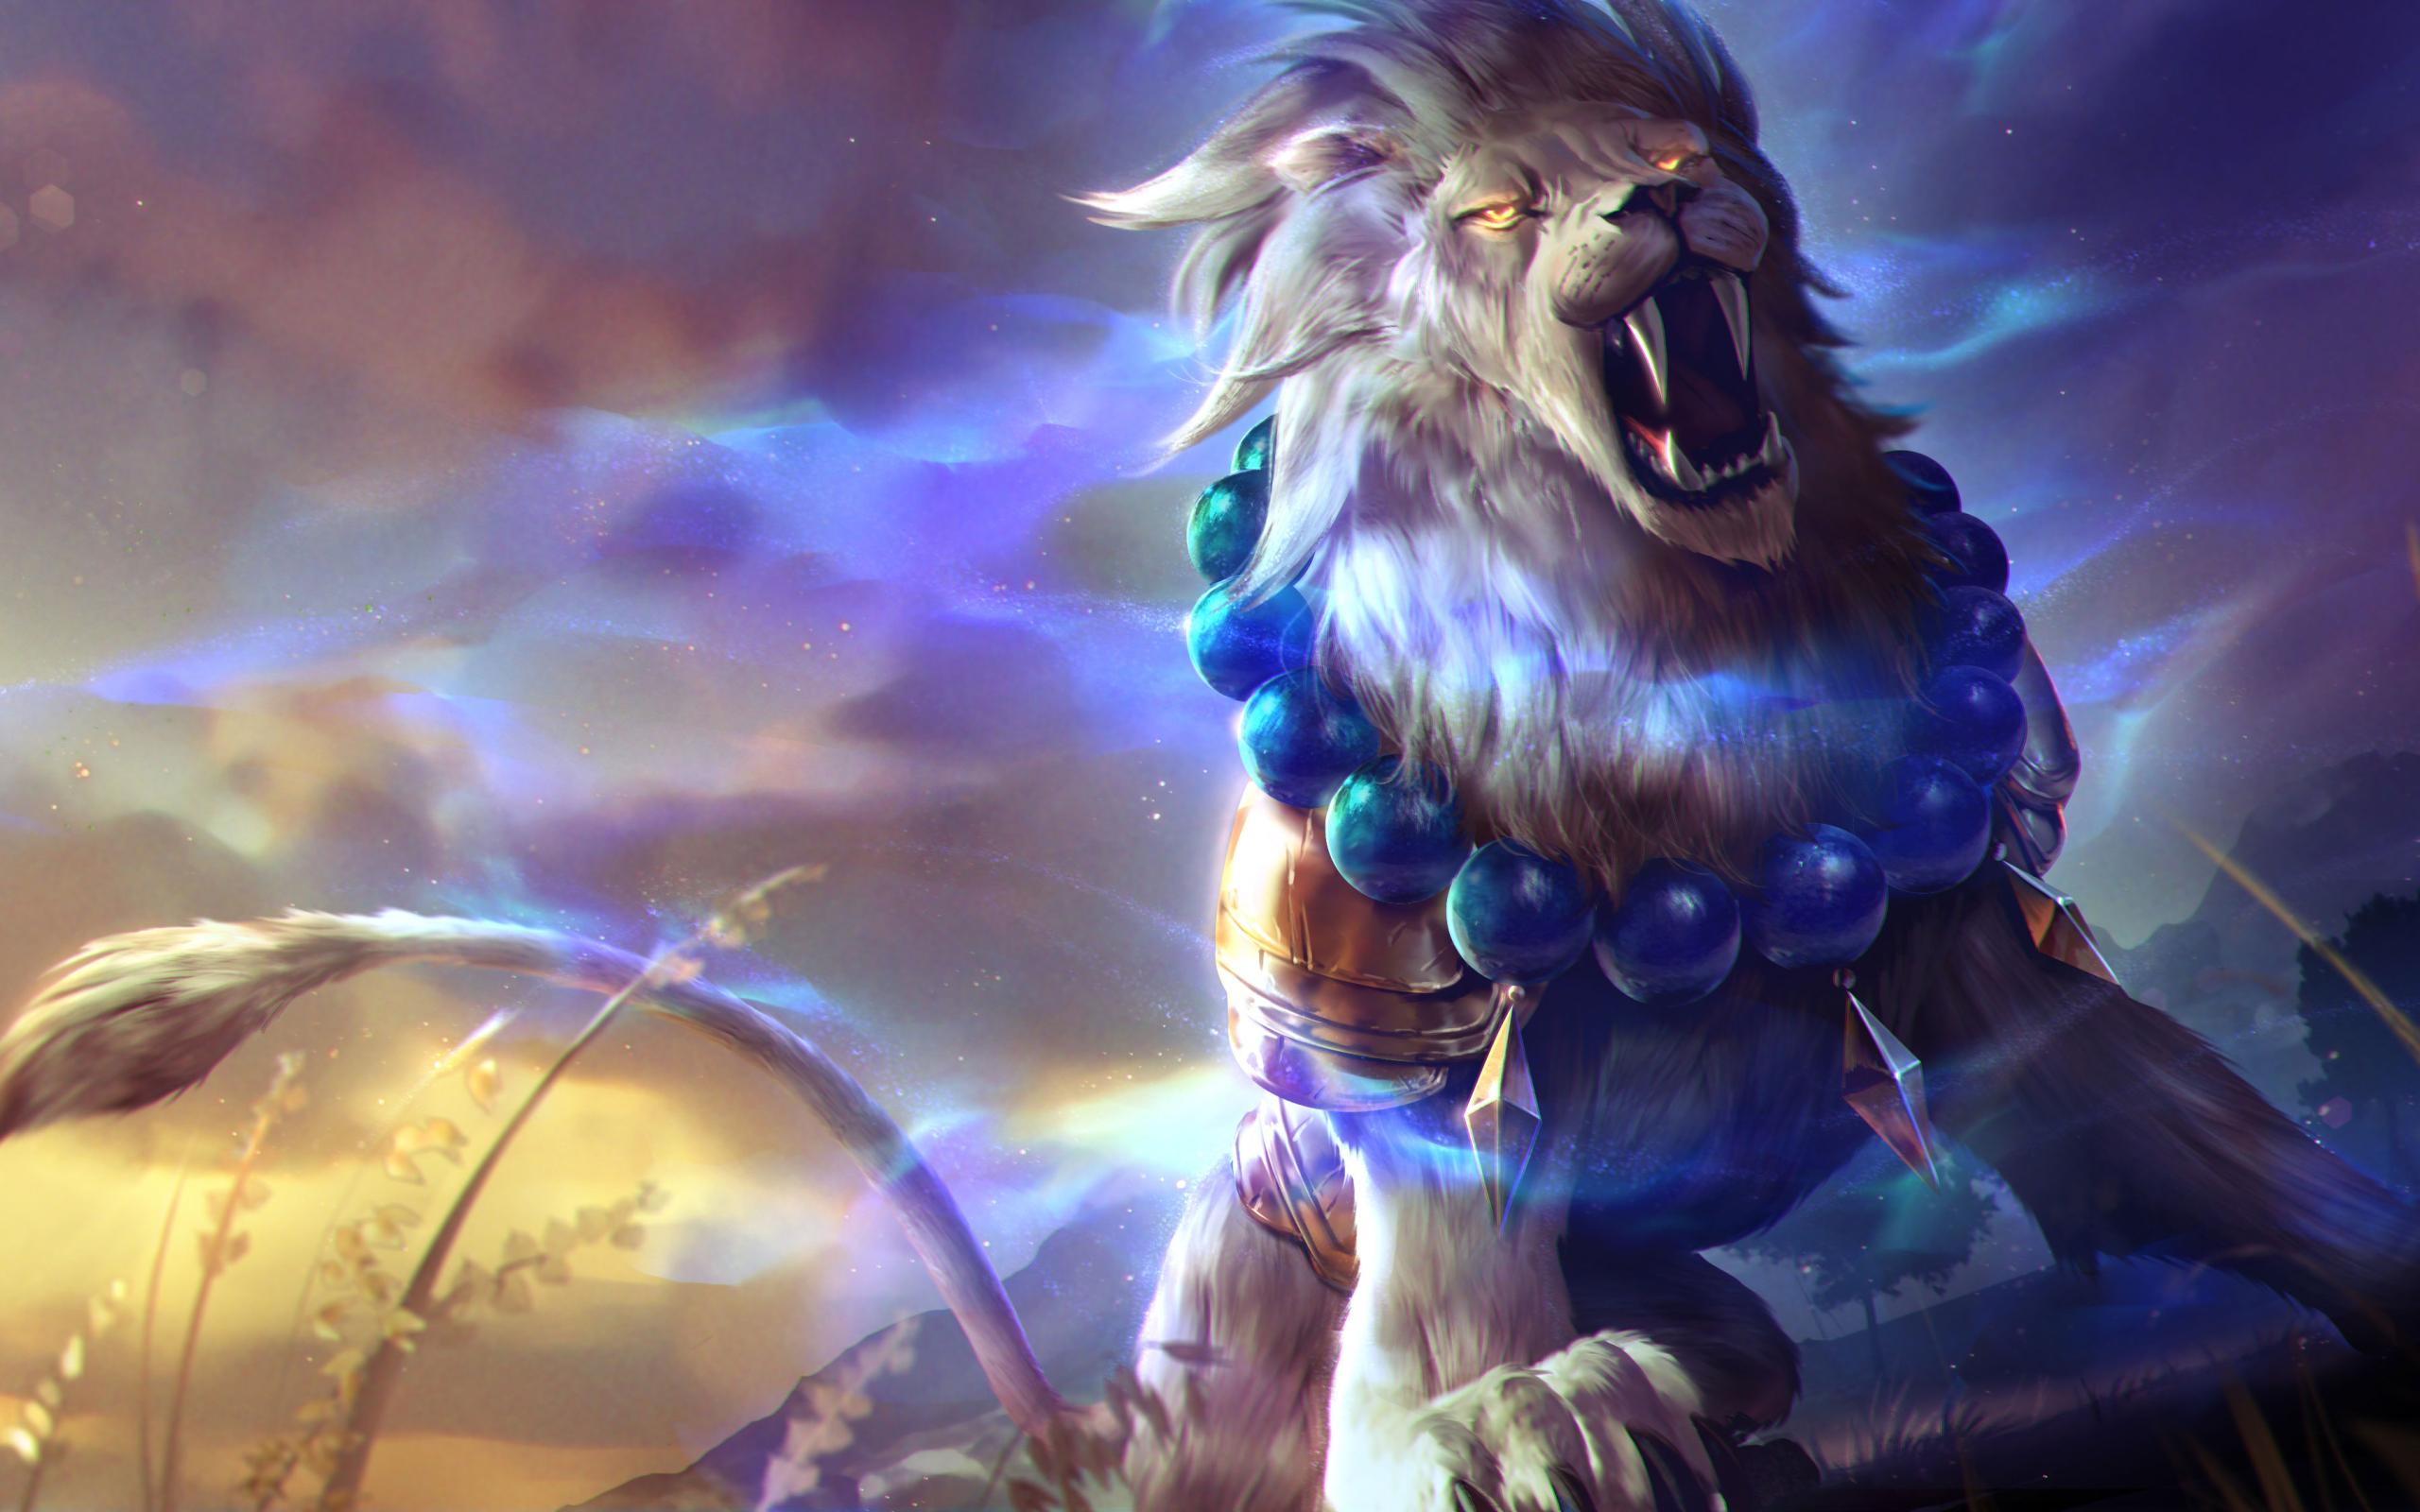 Lion Roar Colorful Fantasy Artwork HD 4K Wallpaper